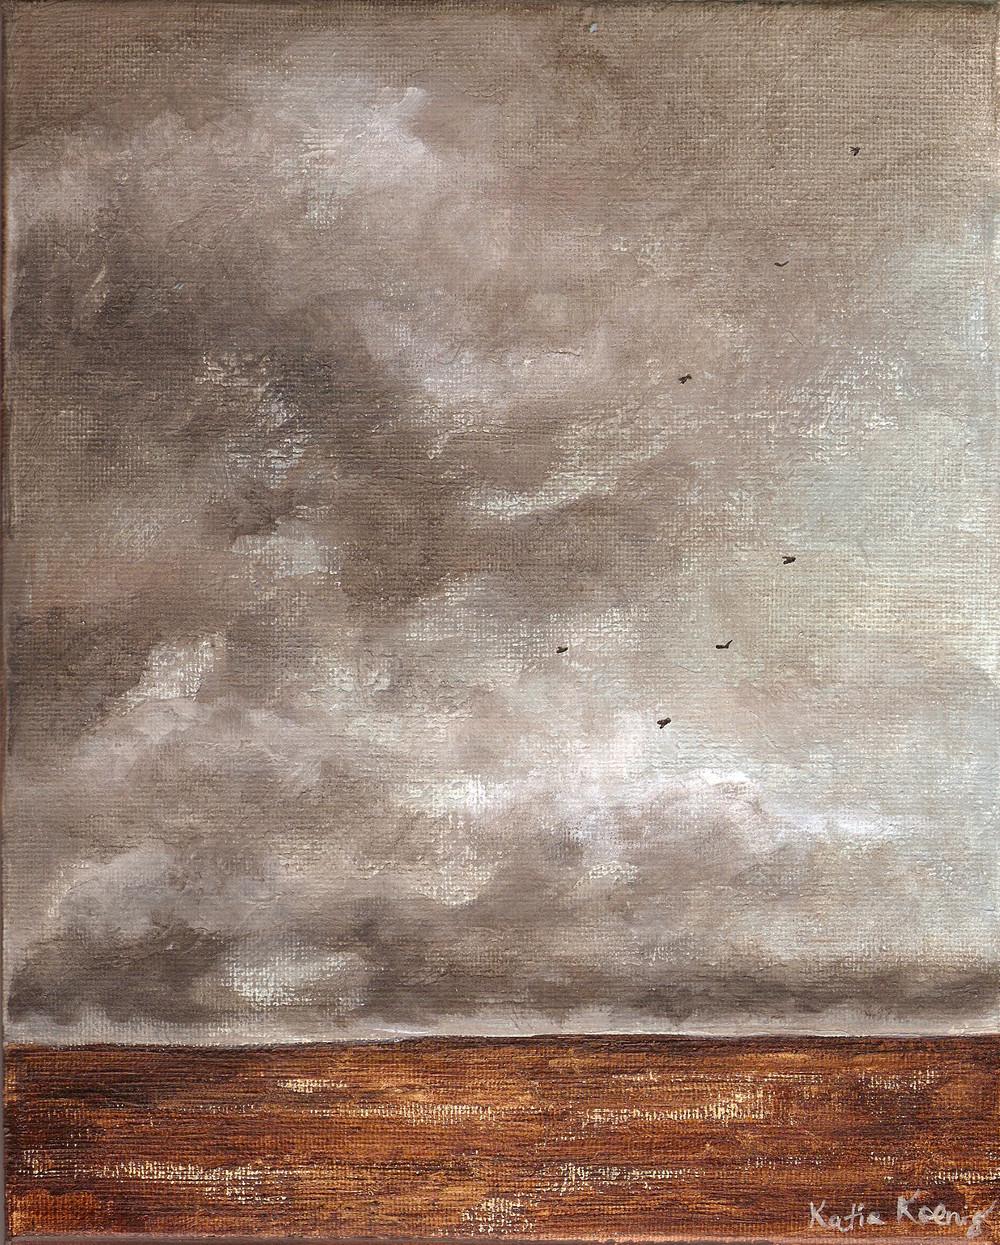 Barren Storm